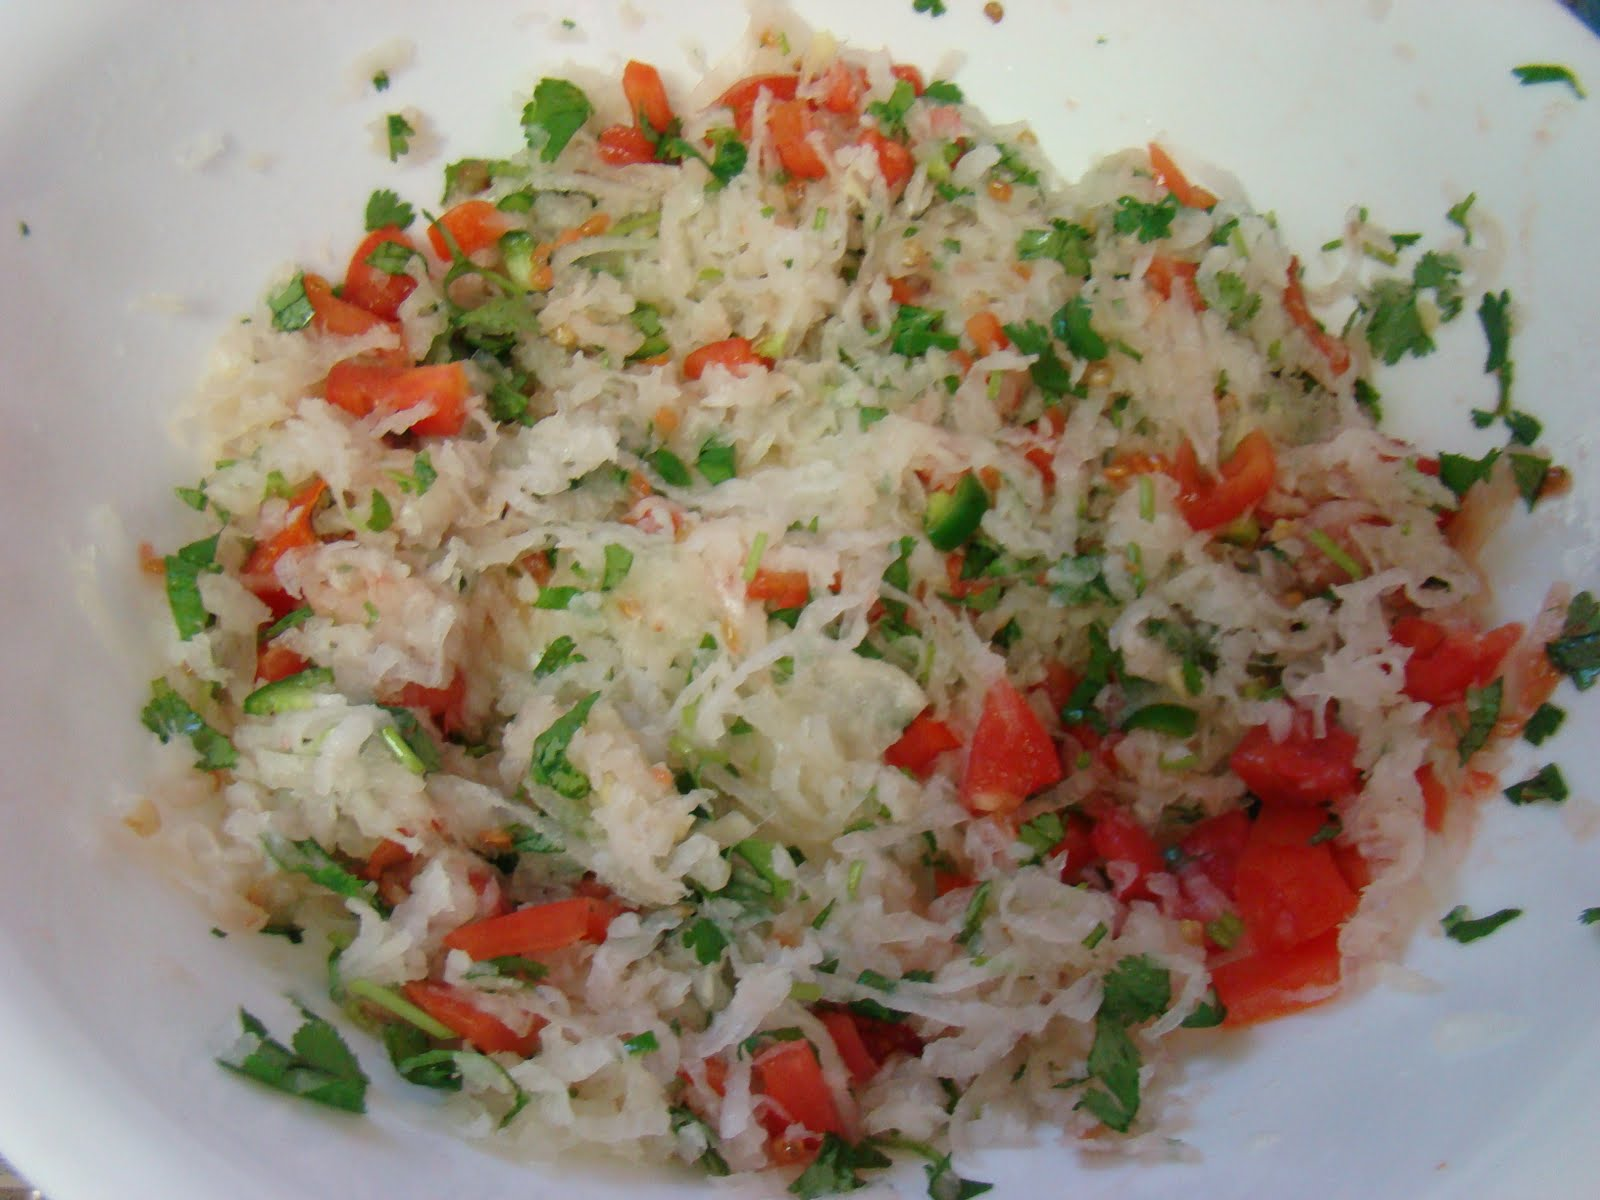 My Favorite Recipes Collection: Daikon/Radish Salad/ Mooli ...